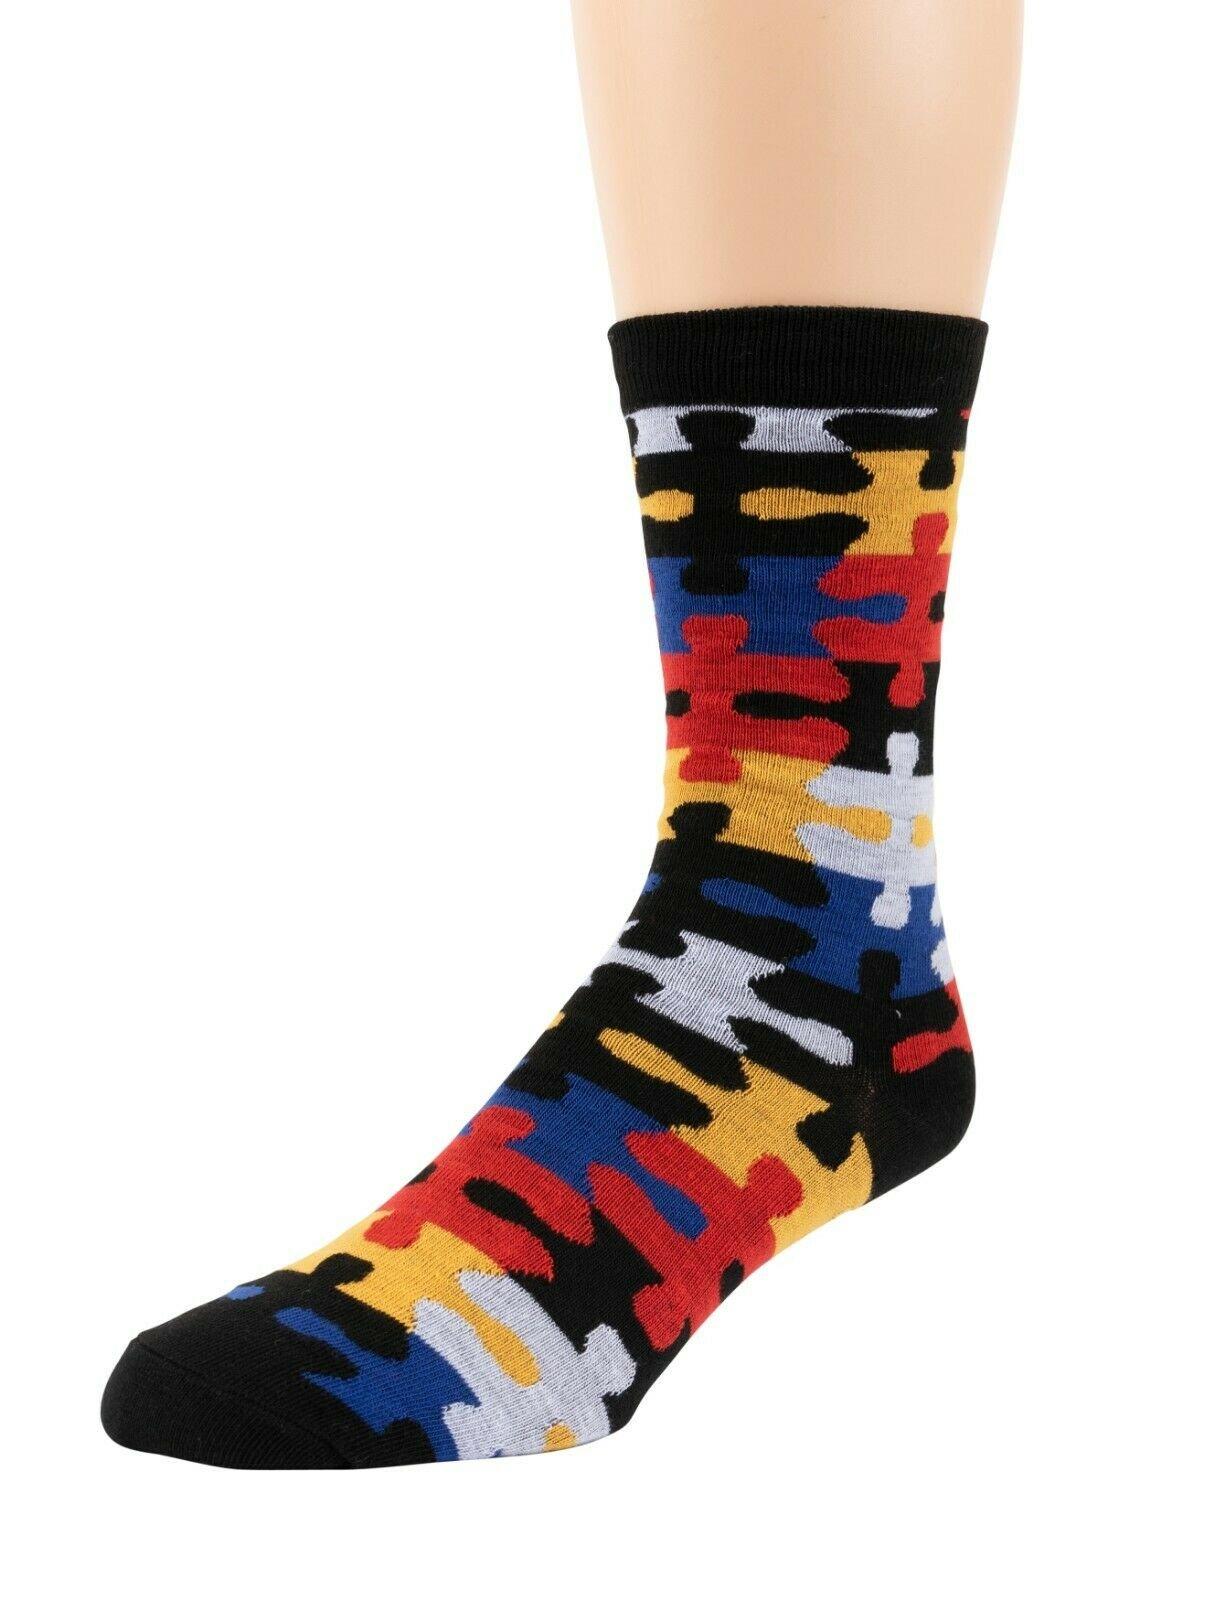 Mitch-Bogen-Mens-Cotton-Dress-Socks-Colorful-Fashion-Crew-Socks-8-Pack-Gift-Box thumbnail 61